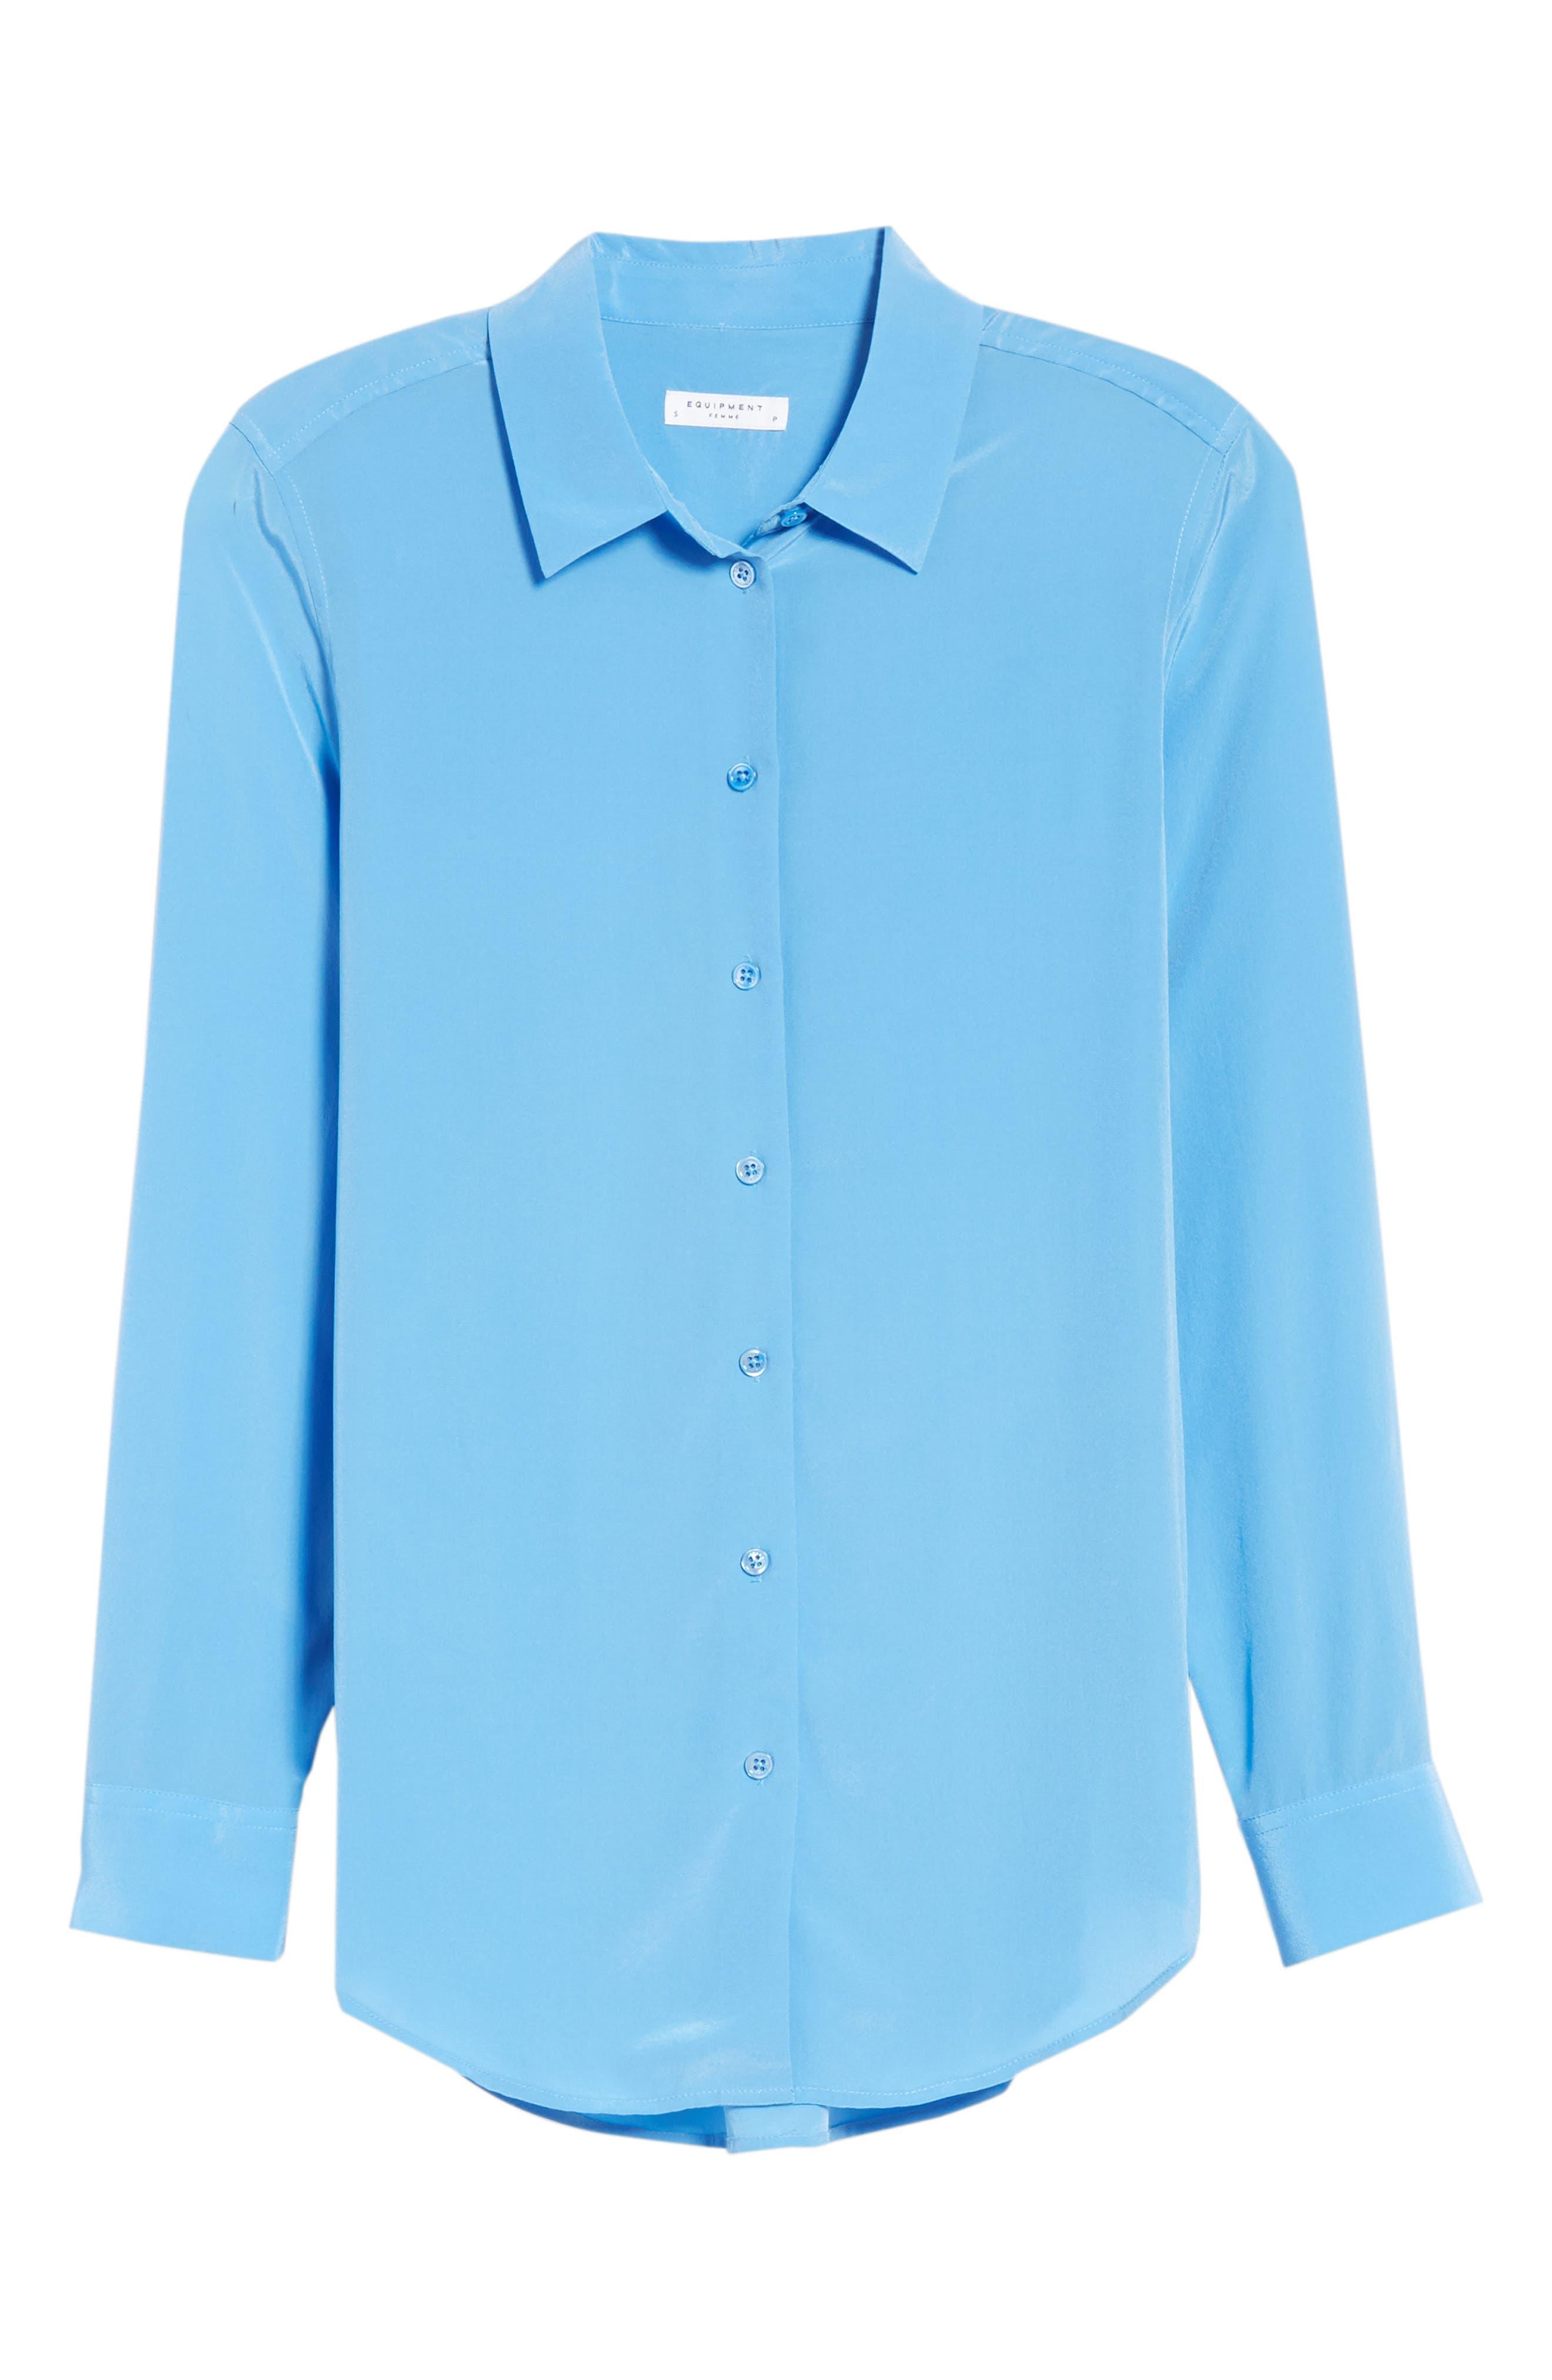 Essential Silk Blouse,                             Alternate thumbnail 6, color,                             ACADEMY BLUE